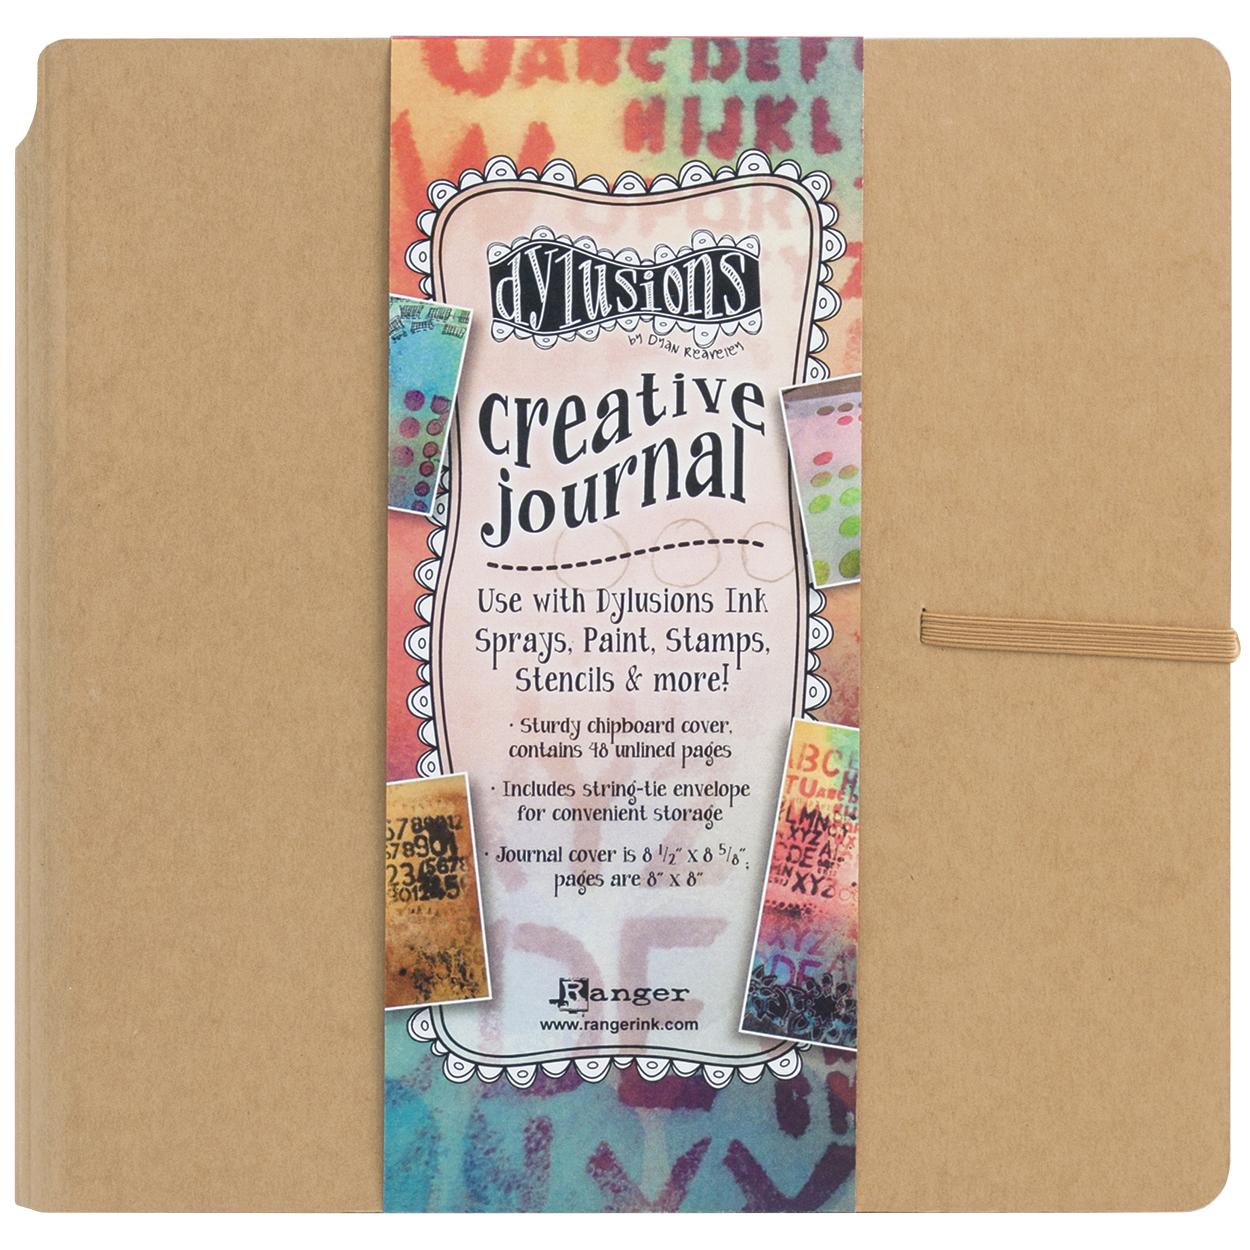 Dylusions journal créatif - Creative Journal